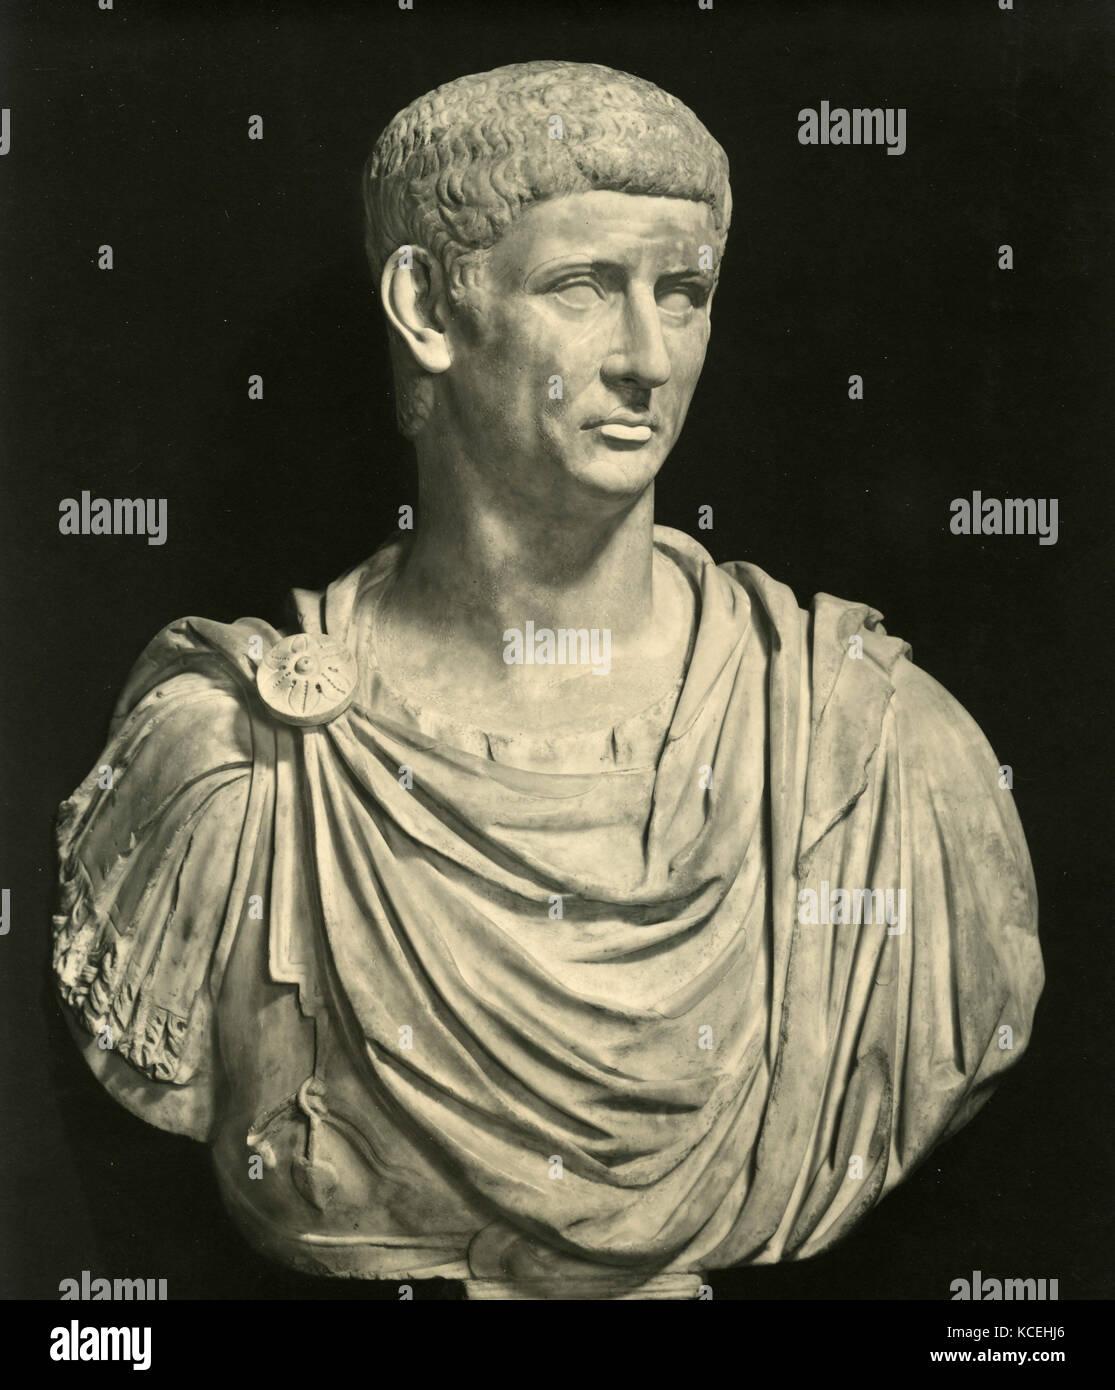 Claudius Roman emperor, marble bust - Stock Image